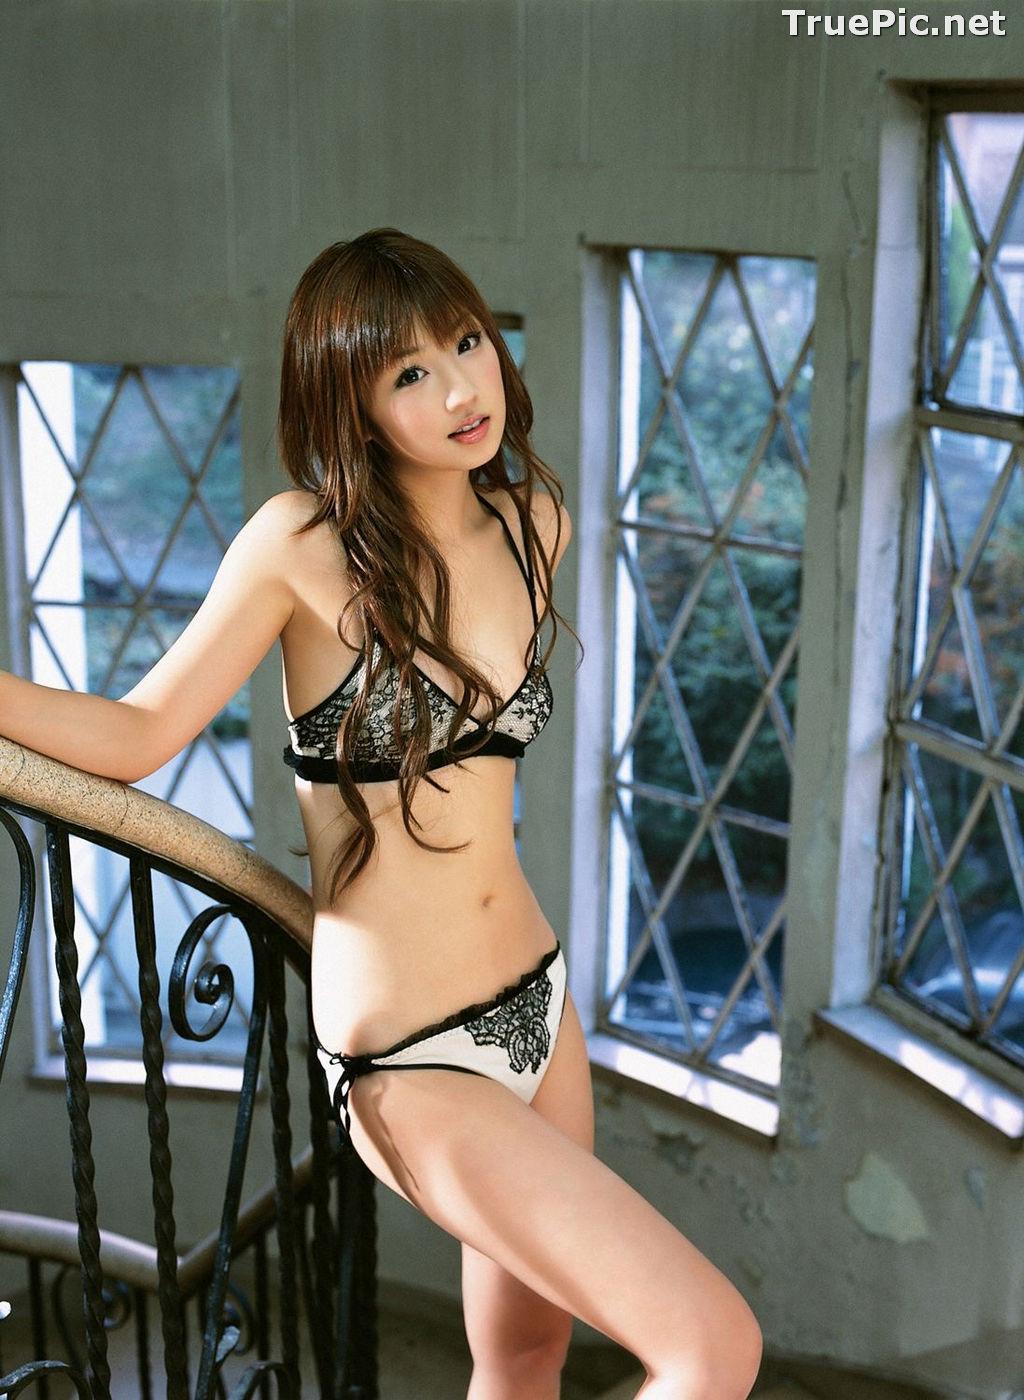 Image YS Web Vol.235 - Japanese Gravure Idol – Yuka Ogura - TruePic.net - Picture-8